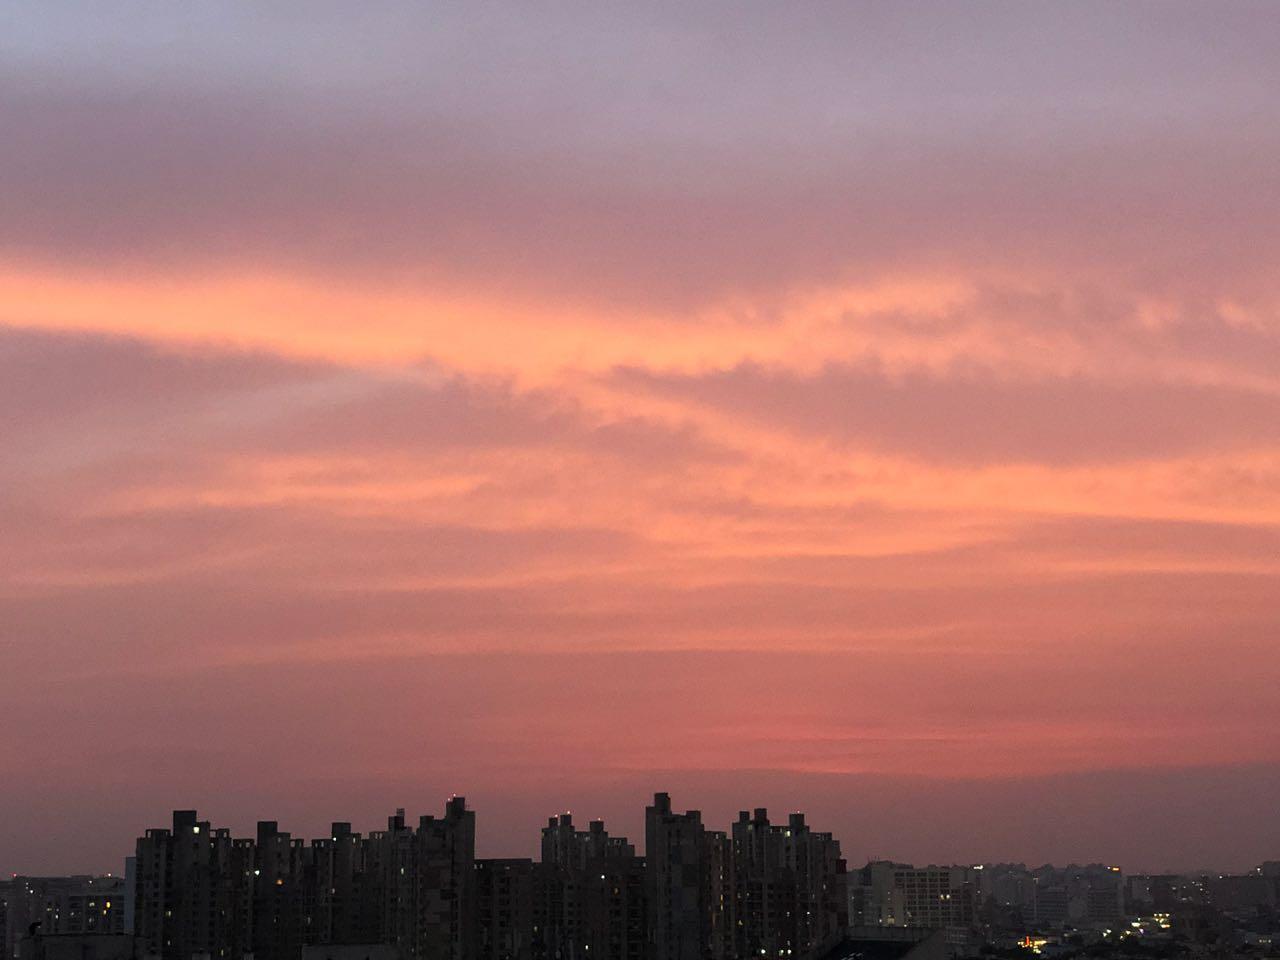 gratitude-circle-monday-musings-natasha-musing-gratitude-for-august-2018-sky